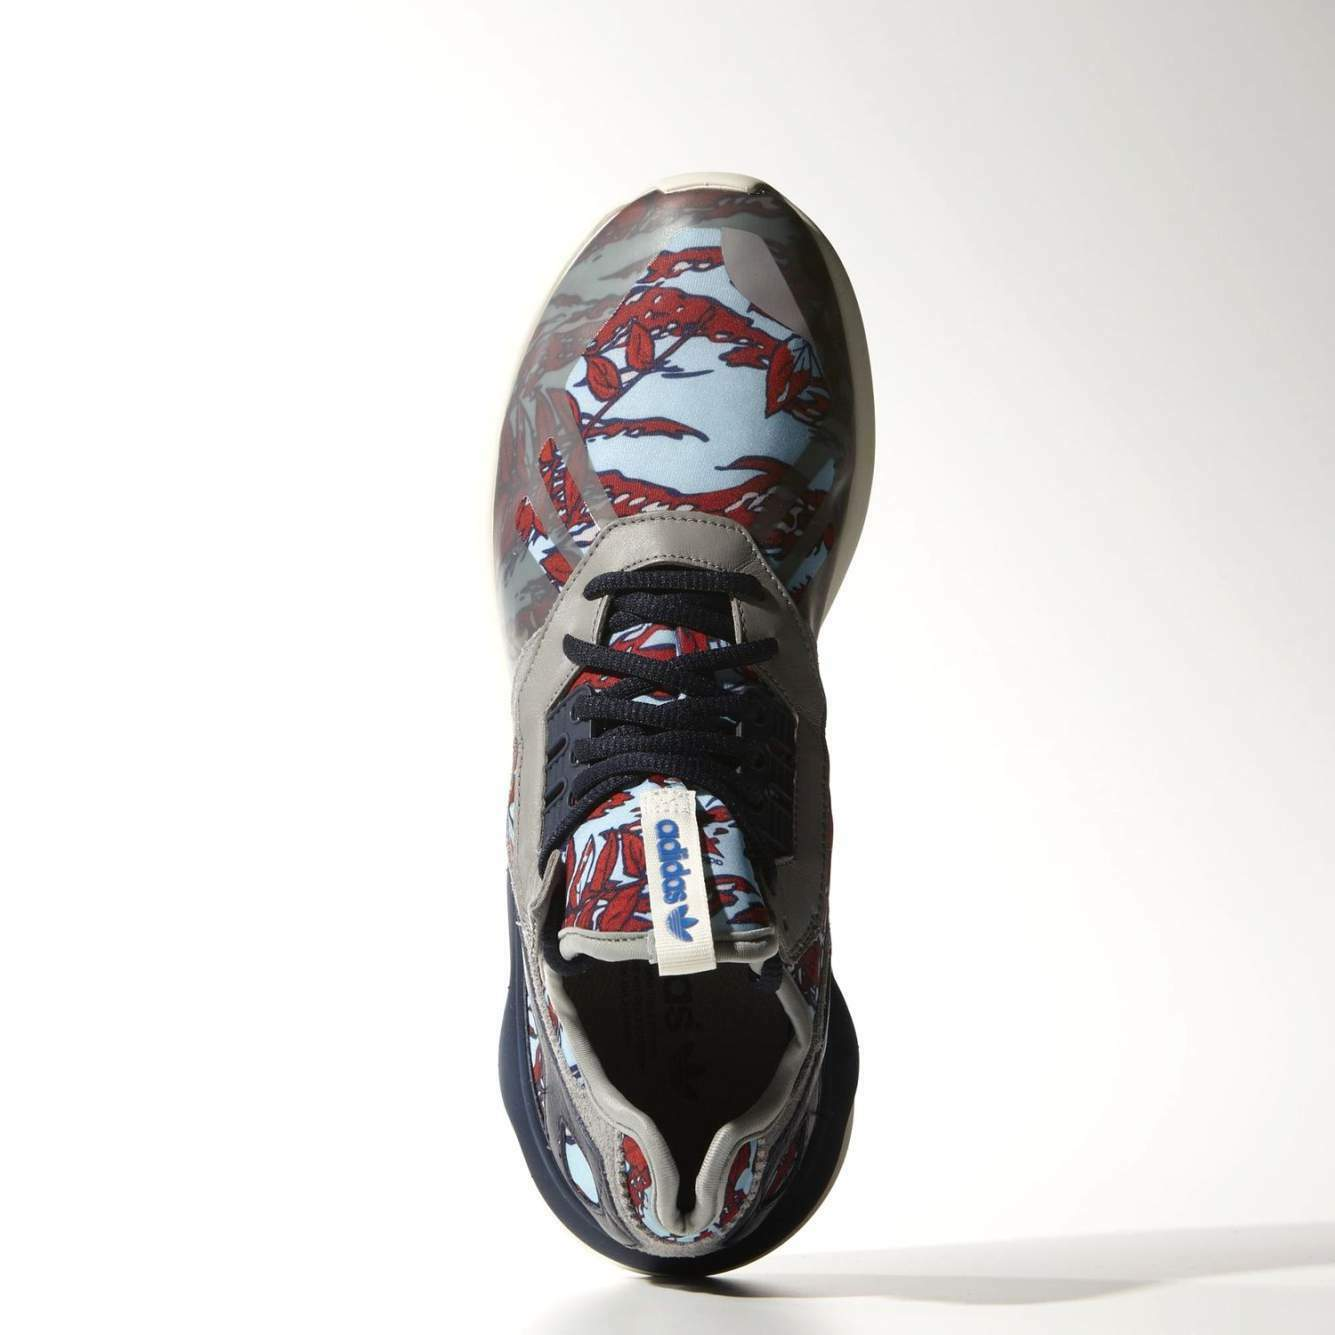 Neue  adidas originals originals originals tubuläre läufer laufen camo fitnessstudio schuh supernova - mens sz 11,5 45fca3